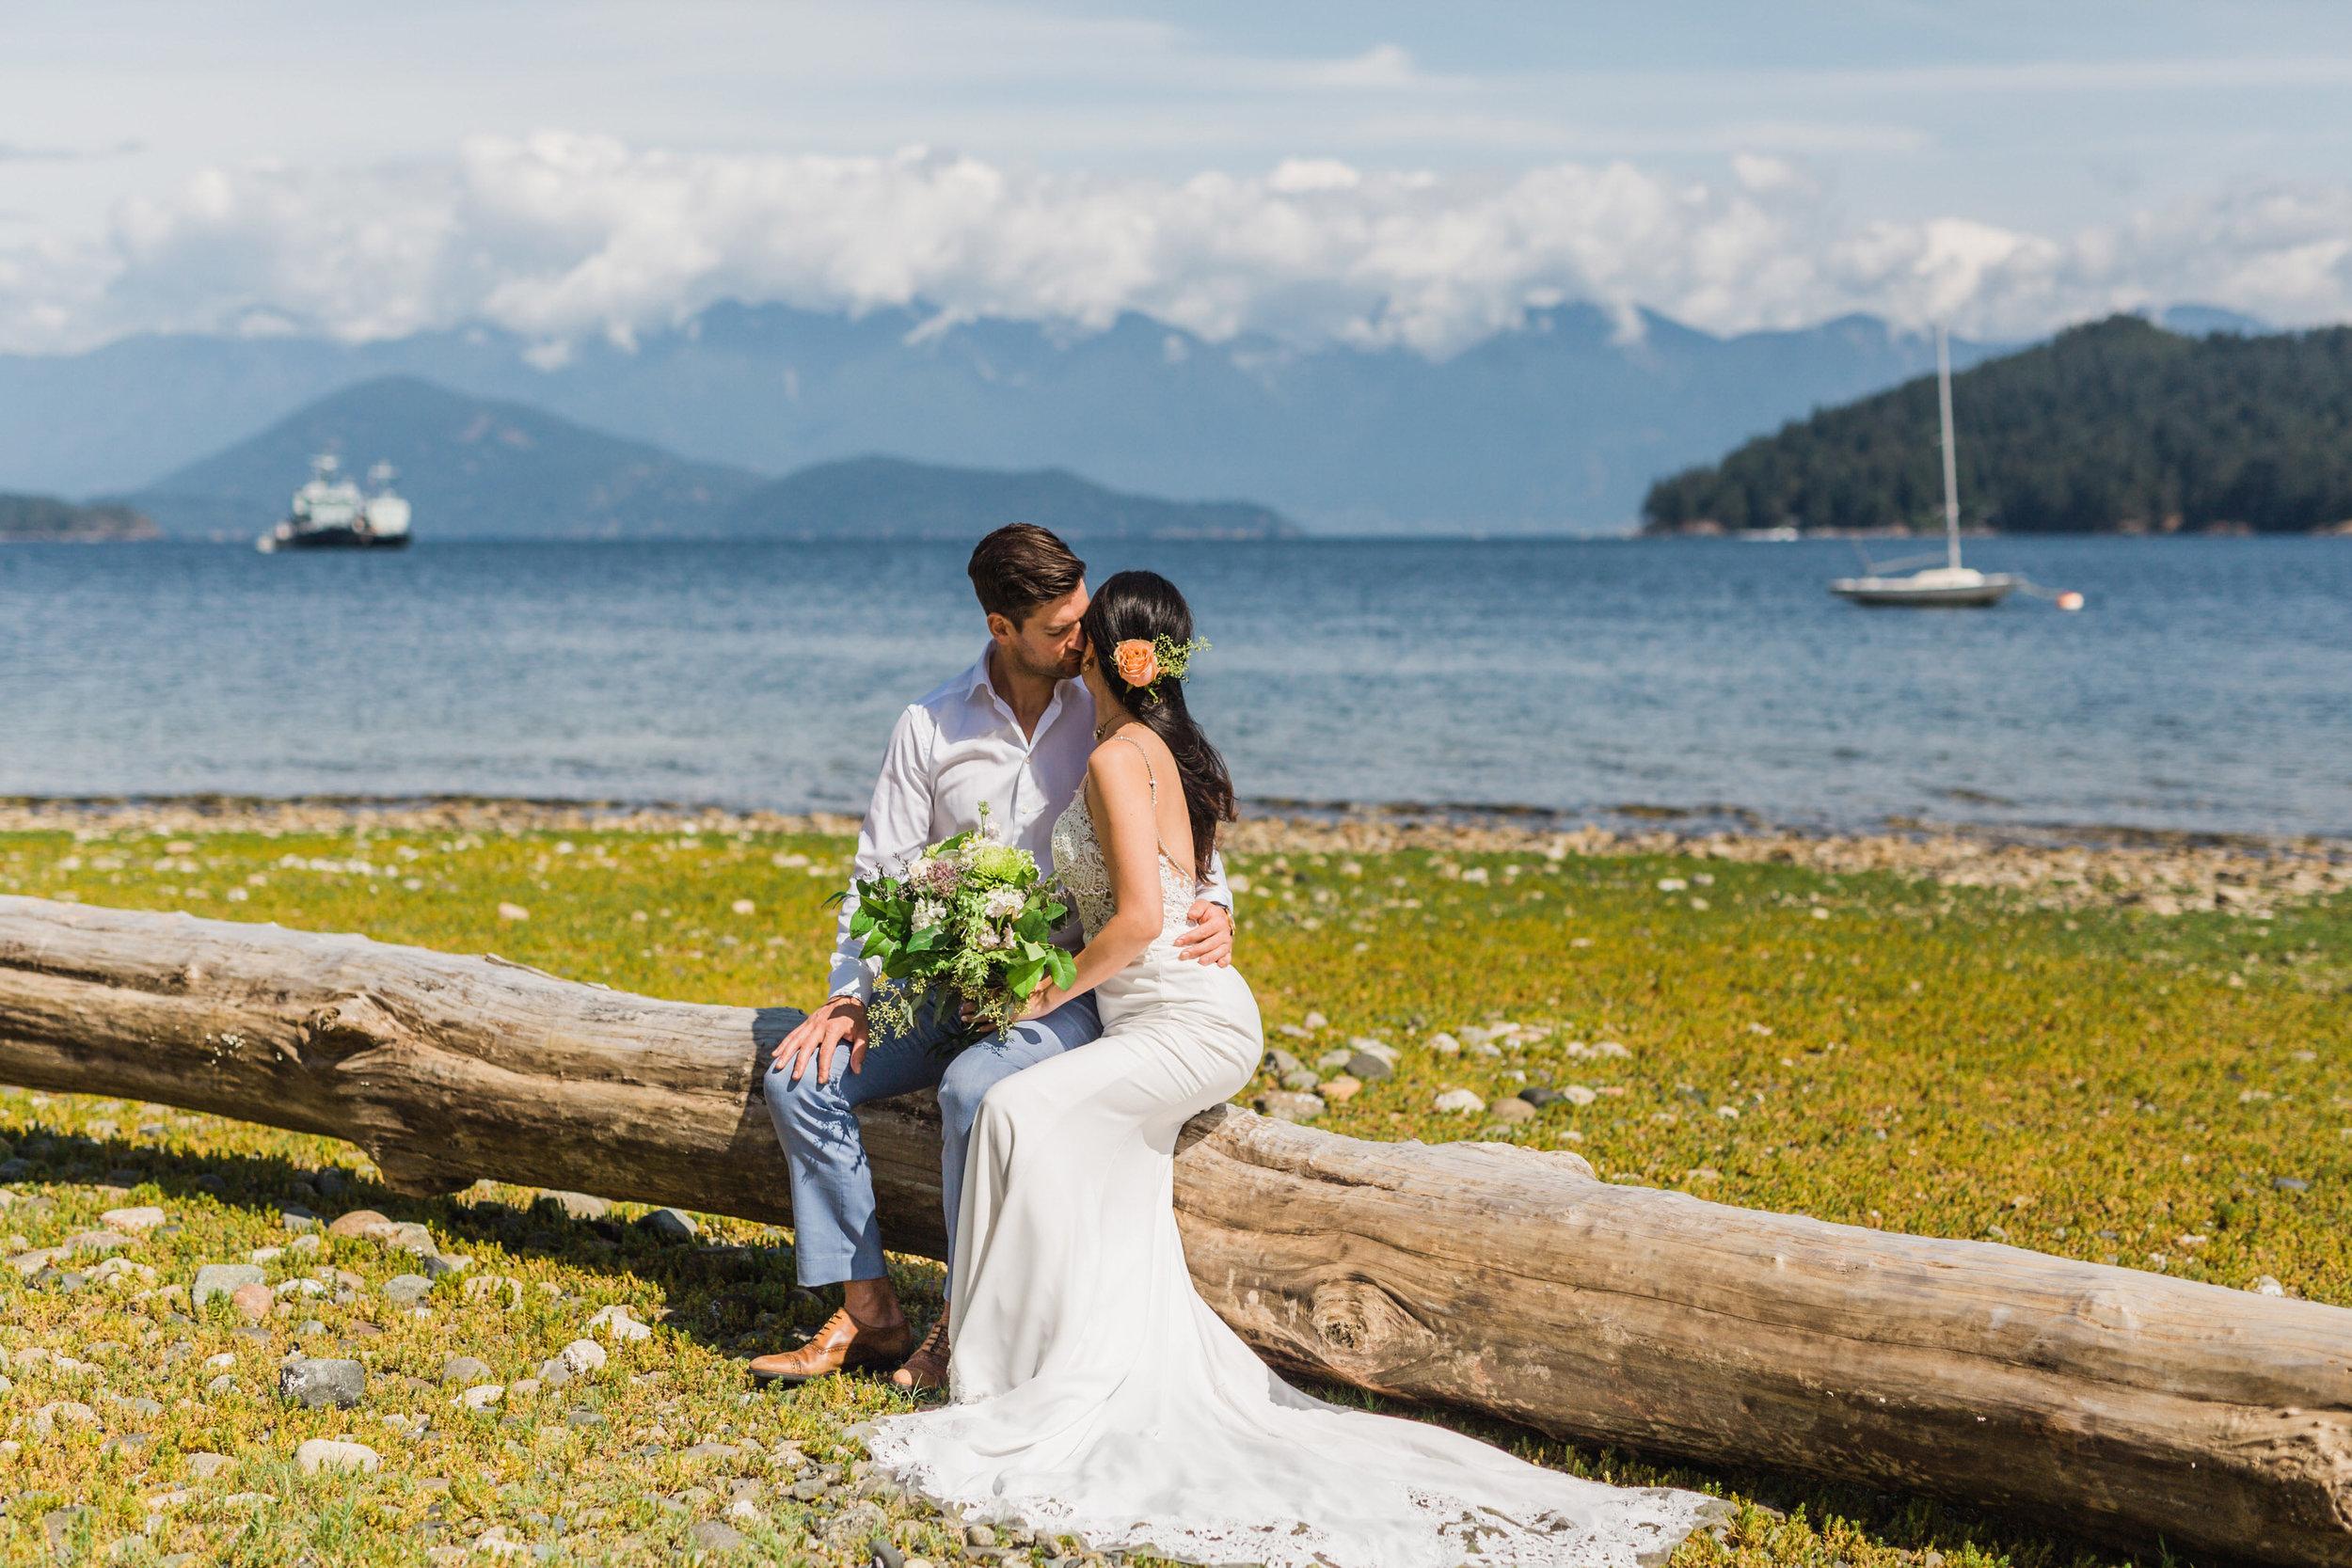 Gibsons Wedding Photos - Sunshine Coast Wedding Photos - Vancouver Wedding Photographer & Videographer - Sunshine Coast Wedding Photos - Sunshine Coast Wedding Photographer - Jennifer Picard Photography - IMG_9729.jpg